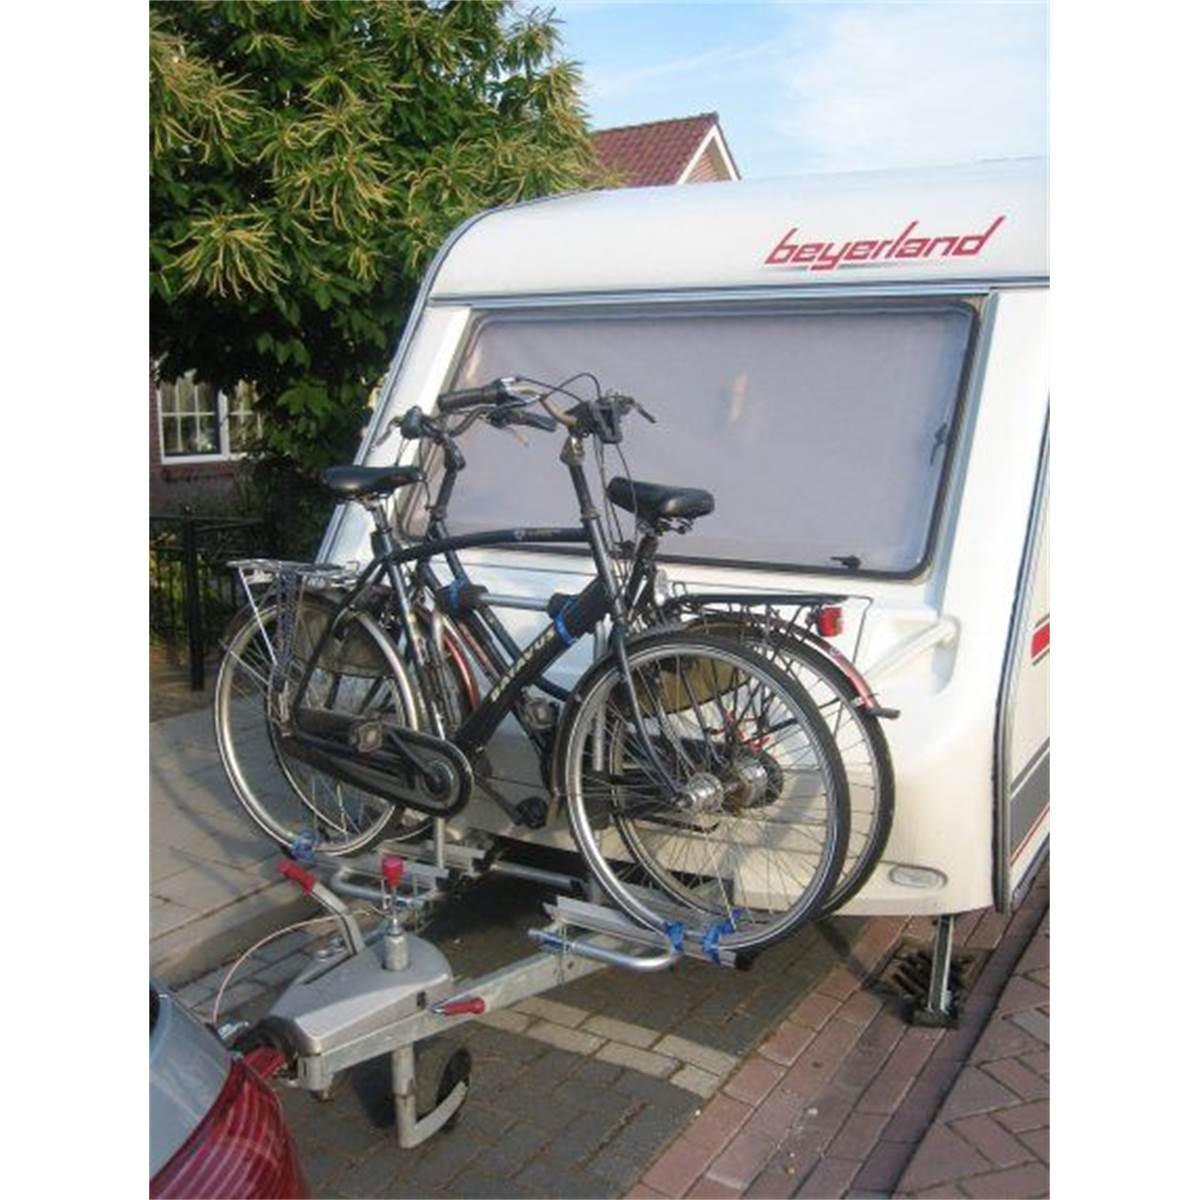 Portevélos Spécial Caravane KWARTS Feu Vert - Porte vélo caravane sur flèche